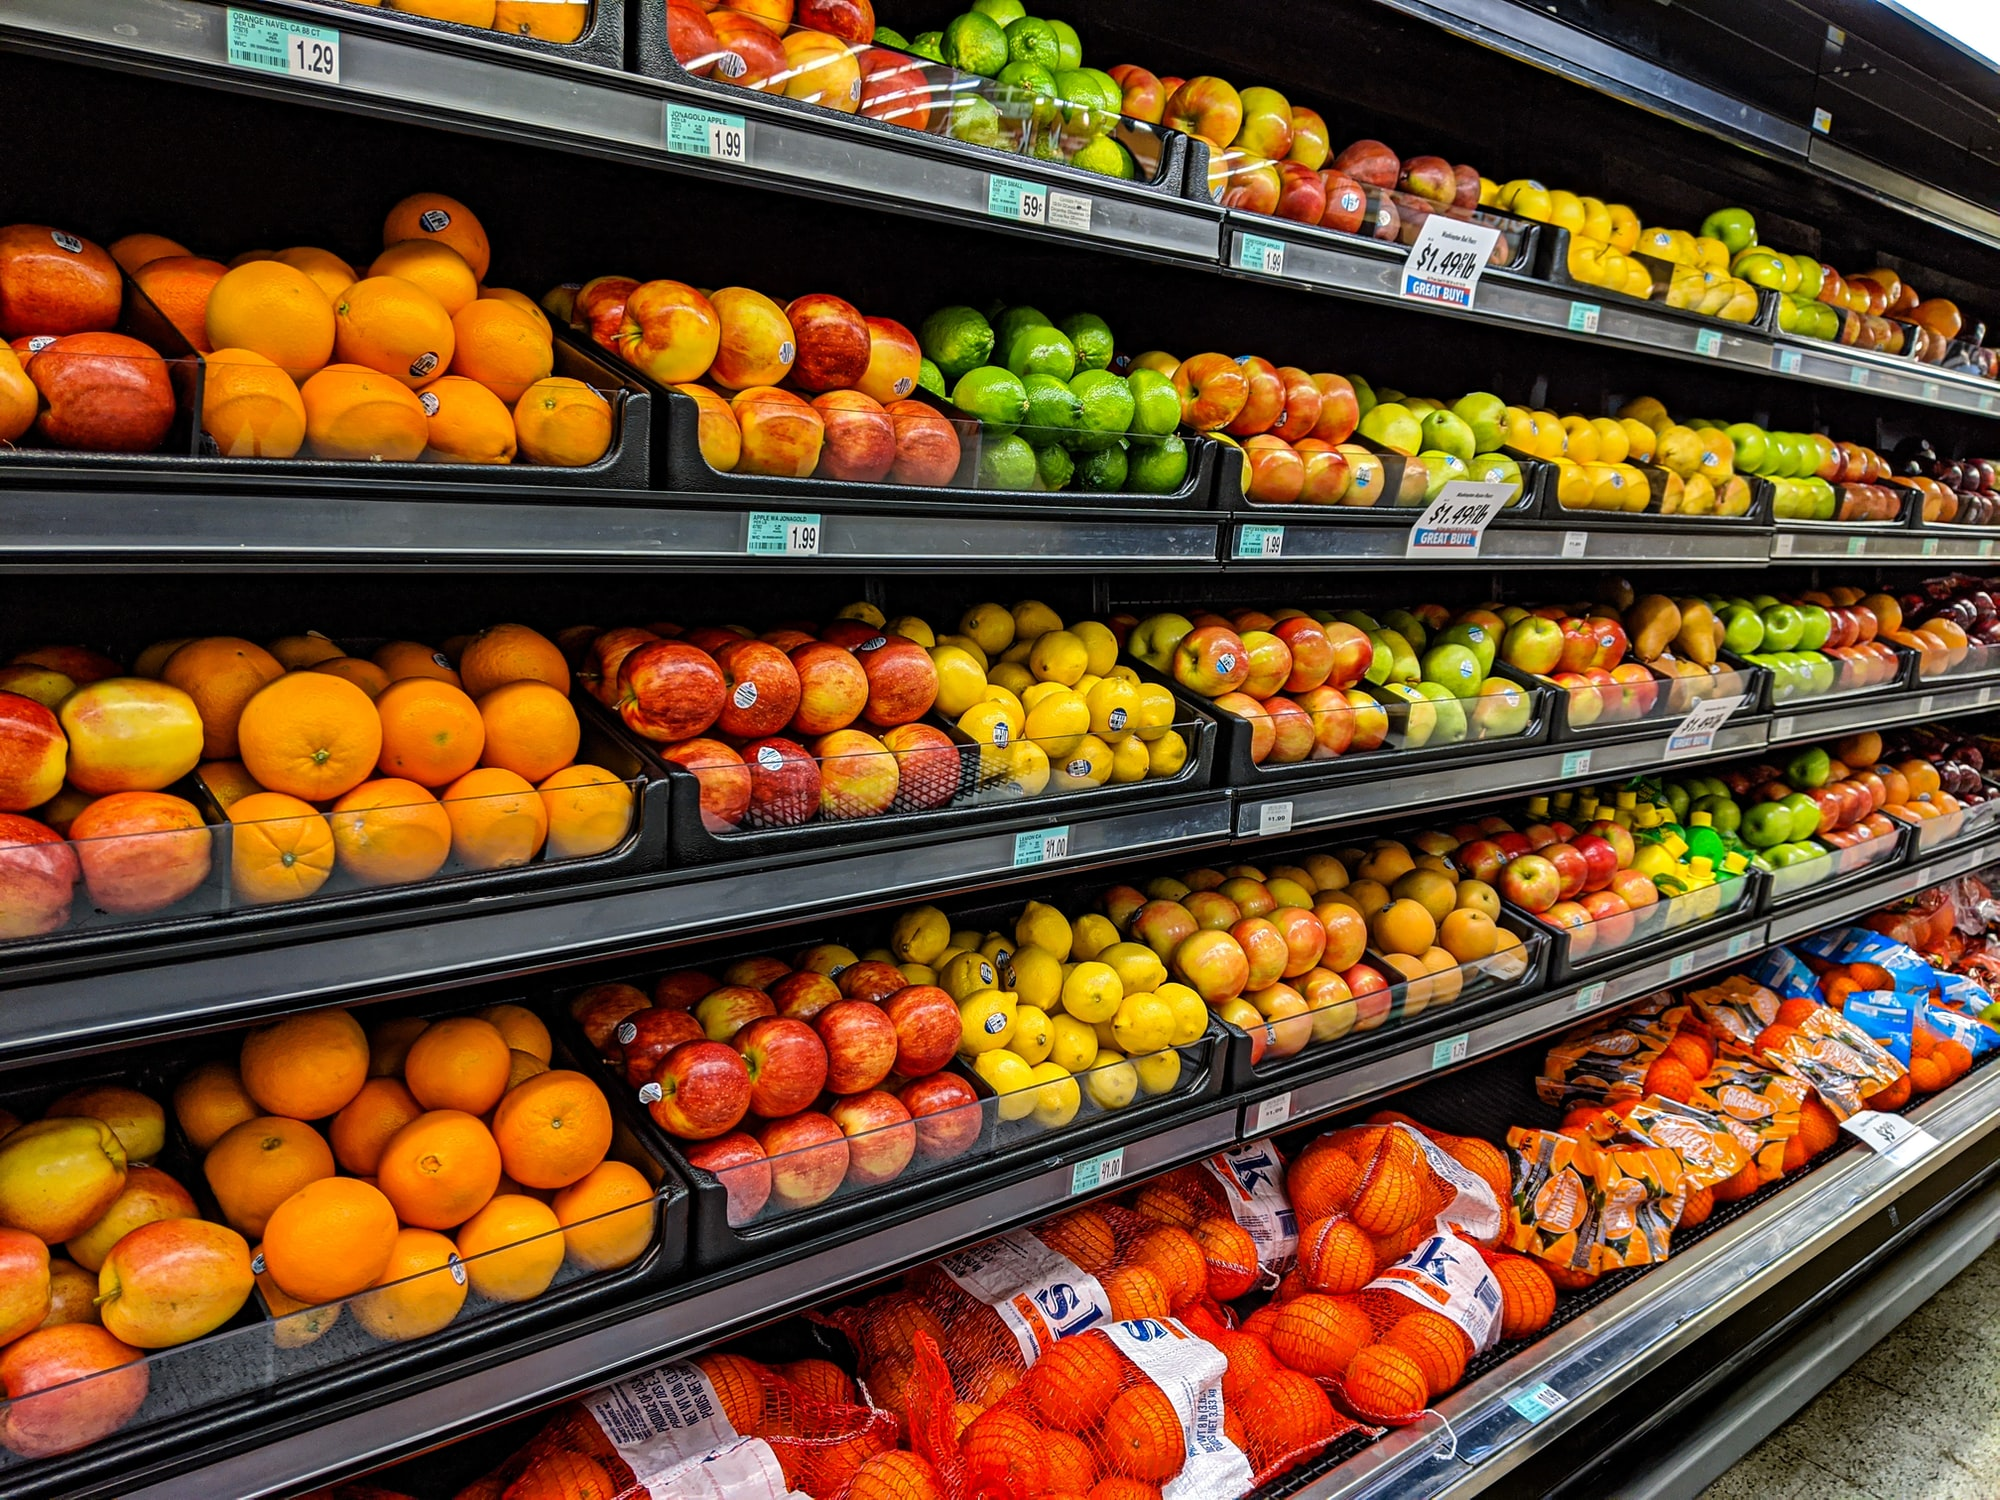 Fruit display in supermarket